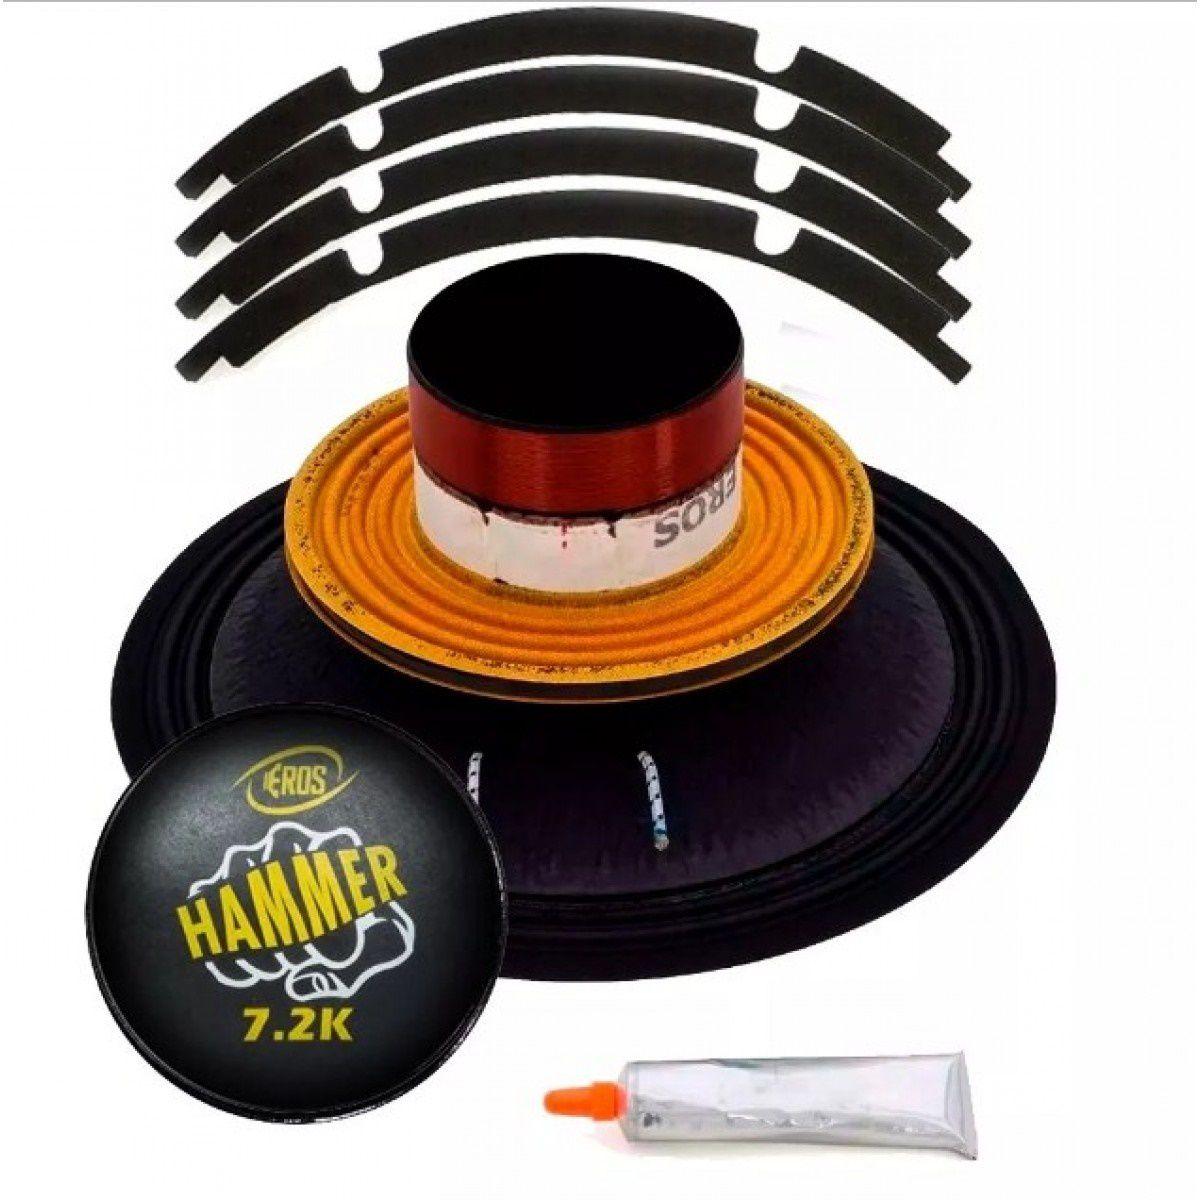 "Kit Reparo para Alto Falante Eros 15"" E15 Hammer 7.2K 3600W Rms 4 Ohms"